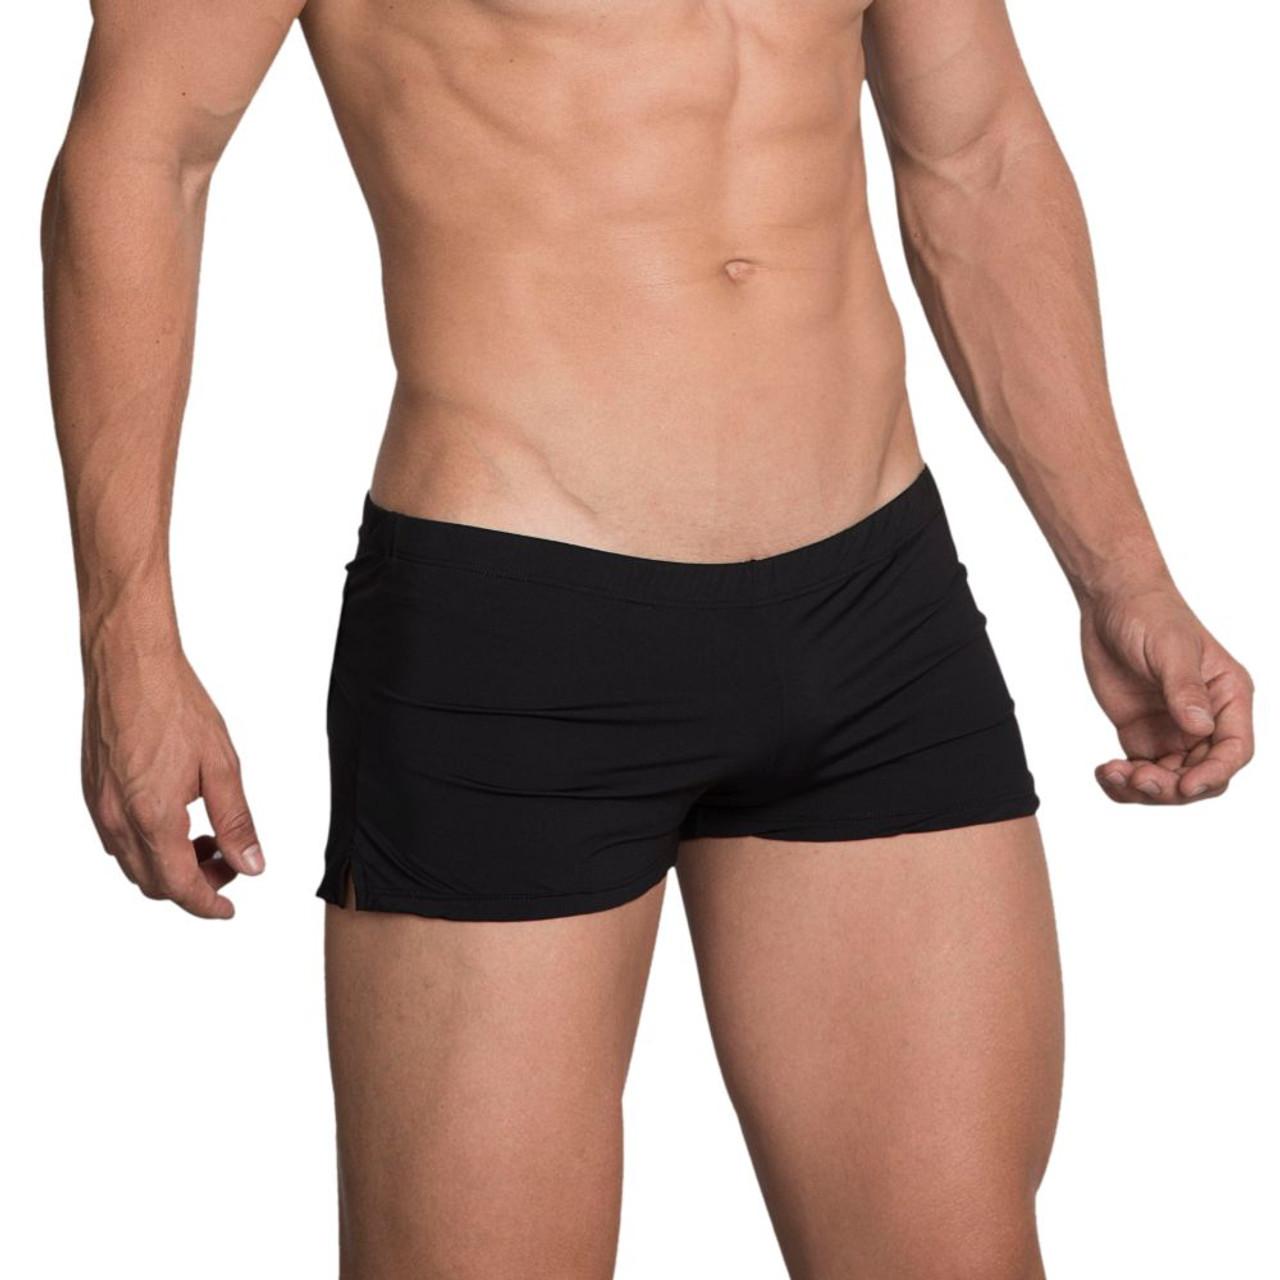 Hidden Underwear Low-Rise Trunks - Comfortable Mens Boxer Style Underwear